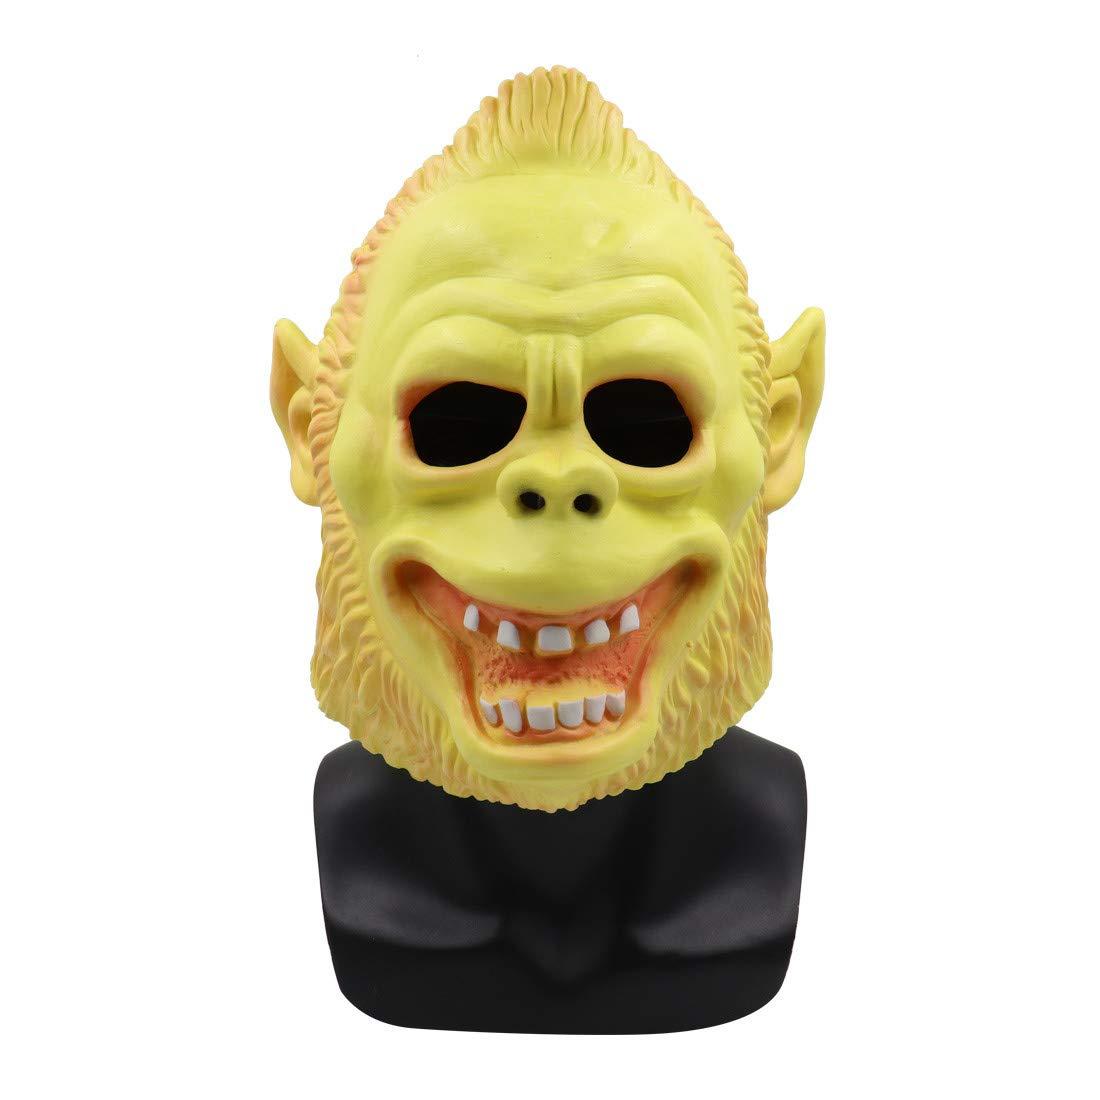 Halloween Mask,Meetsunshine Scary Animal Orangutan Latex Mask with Hair Cosplay Helmet Halloween Costume for Men Women Boy Girl Kids by Meetsunshine Halloween